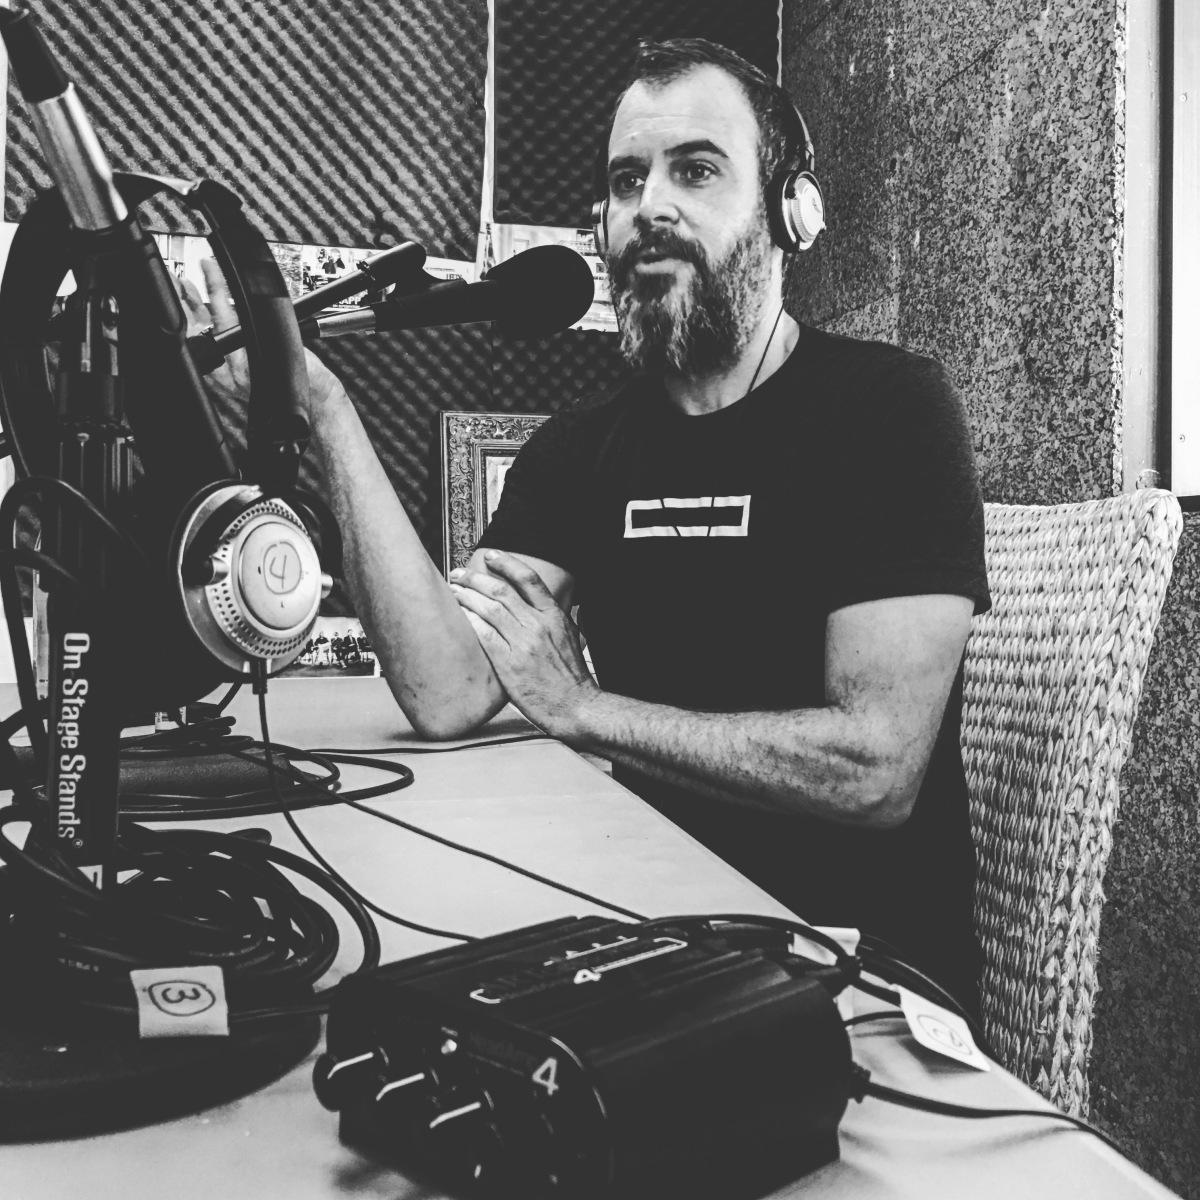 stay true radio welcomes back rob hammelman from sand reckoner